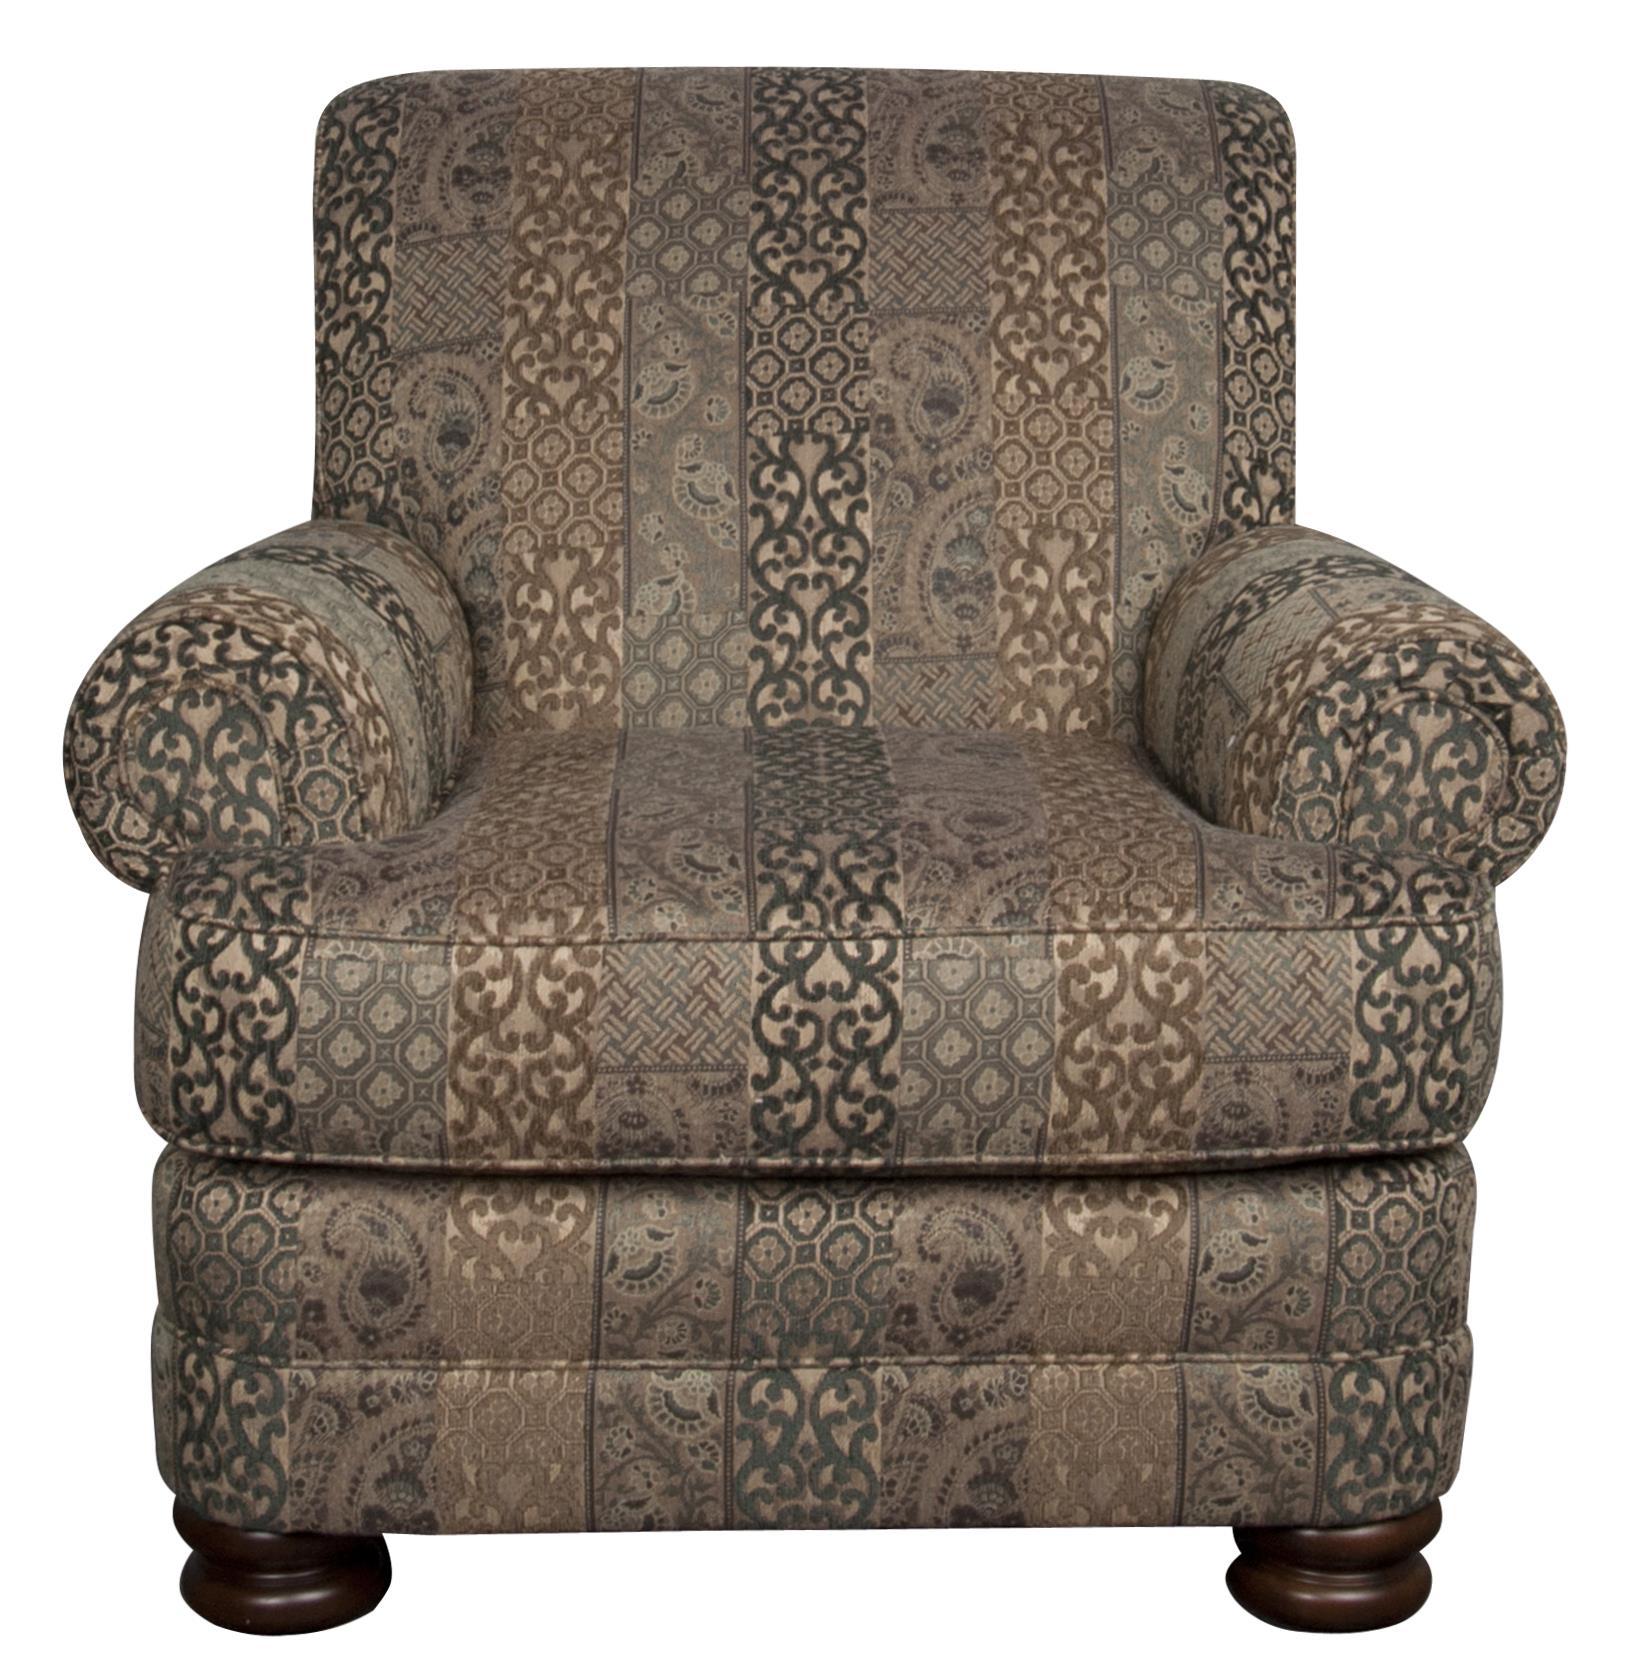 Morris Home Furnishings Bexley Bexley Chair - Item Number: 768214303